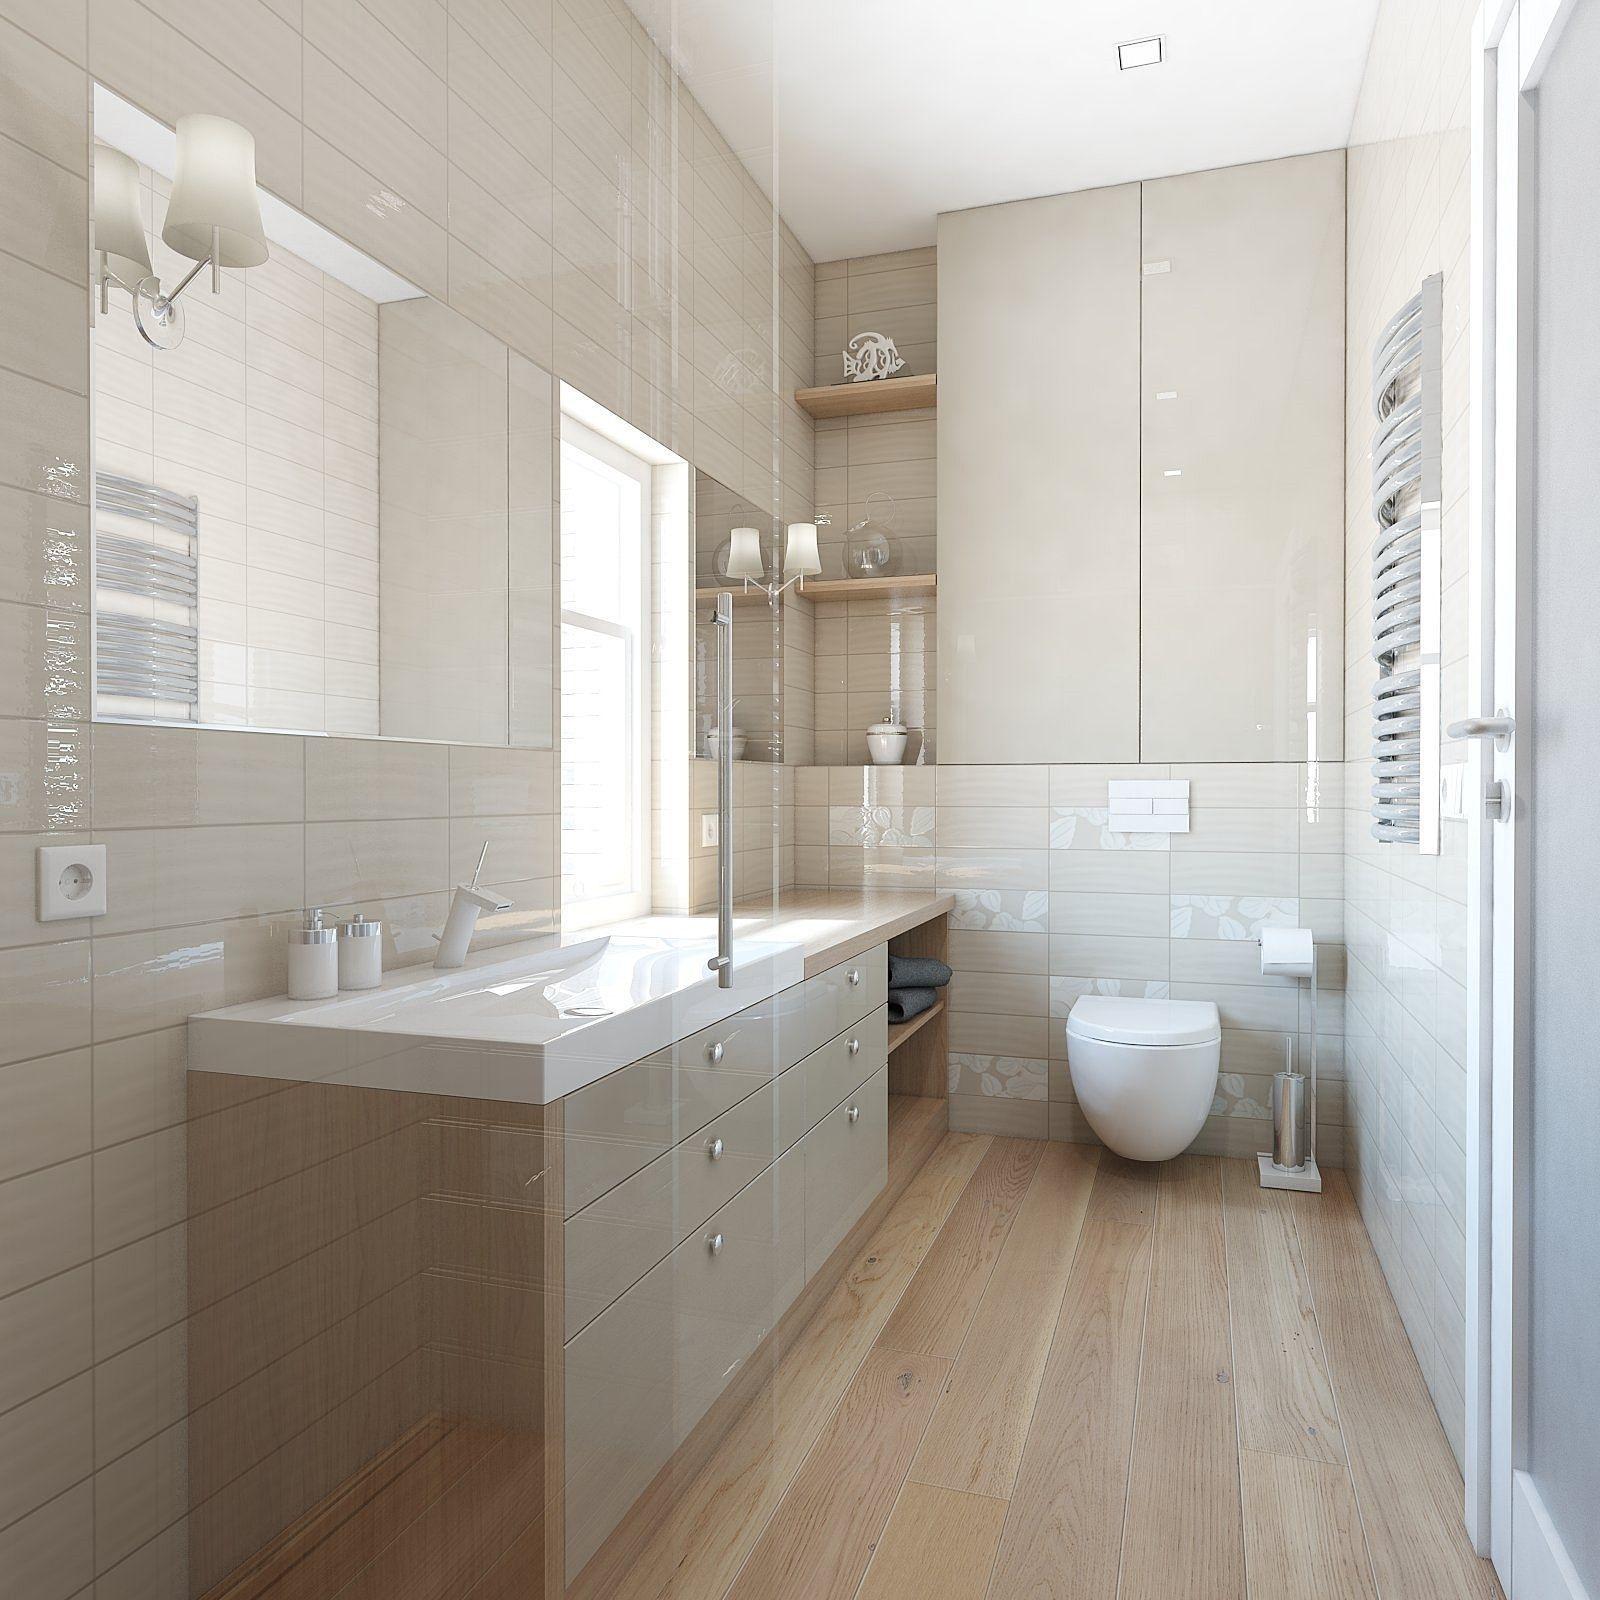 Home Decor Ideas » Amazing Bathroom Models